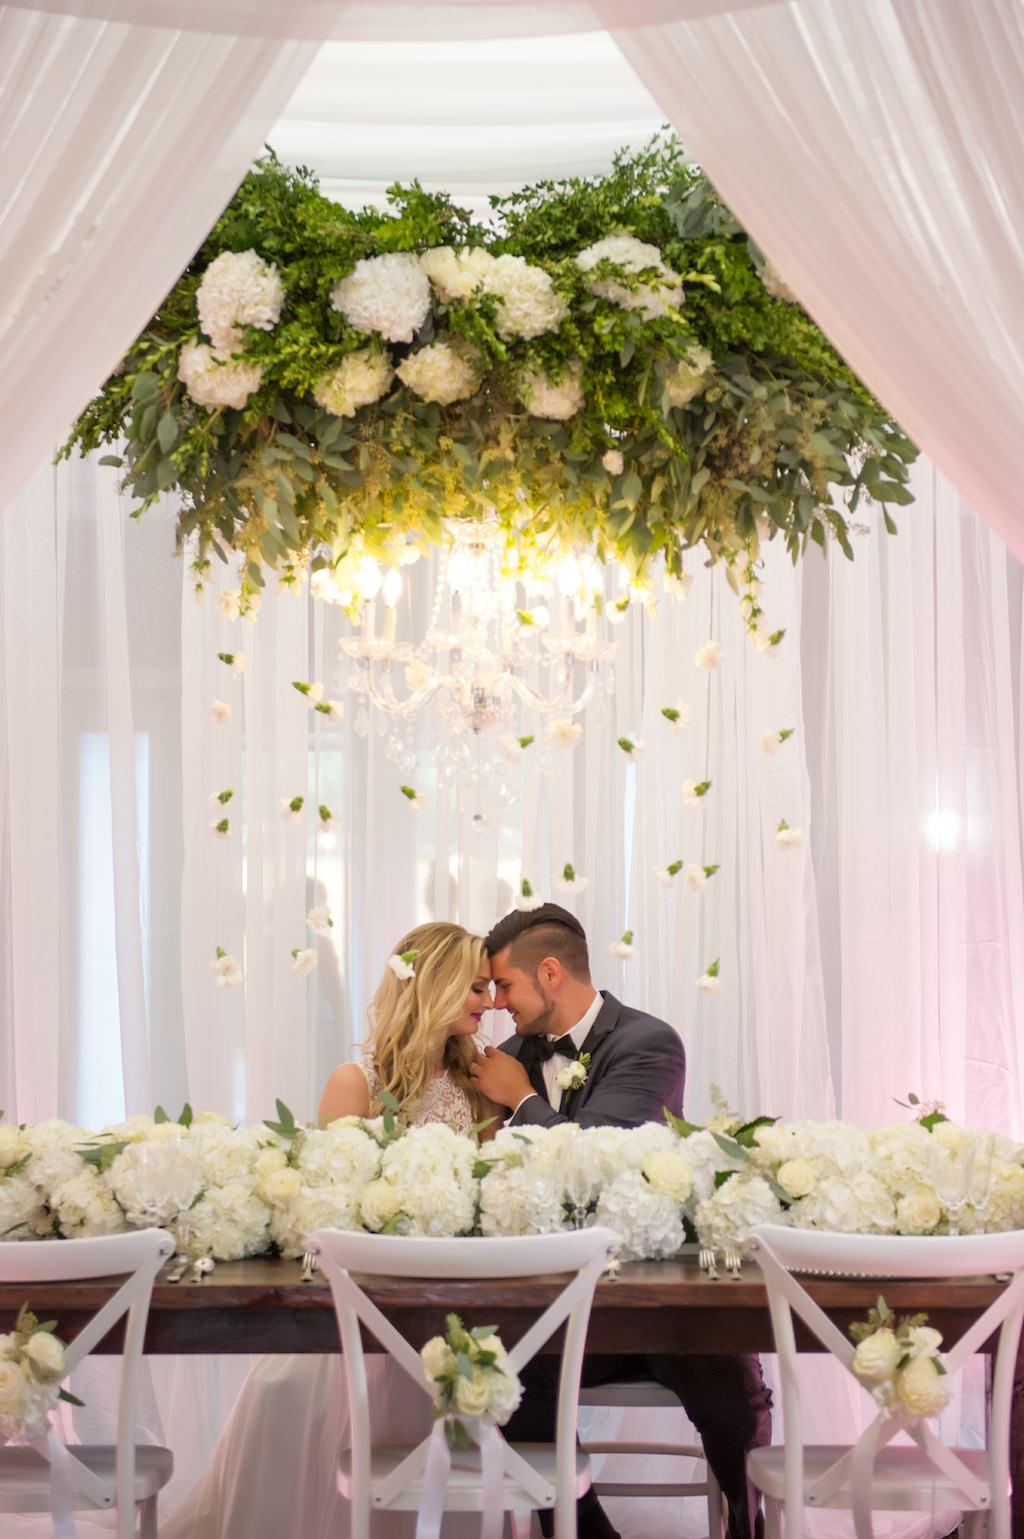 Elegant Southern White Wedding Reception Bride And Groom Portrait